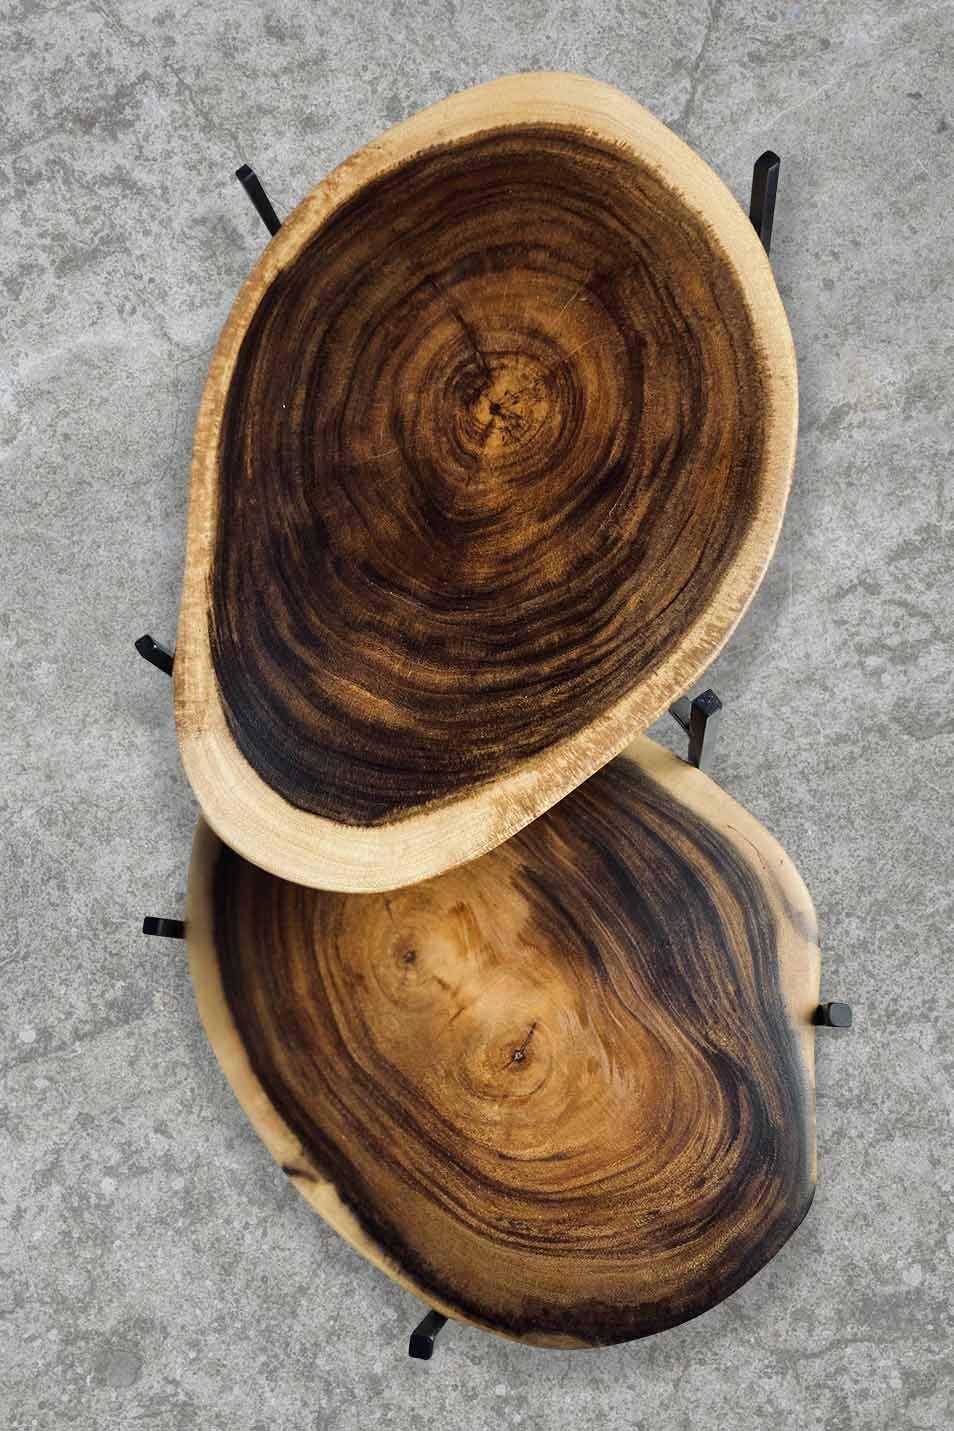 Chase Suarwood coffee table